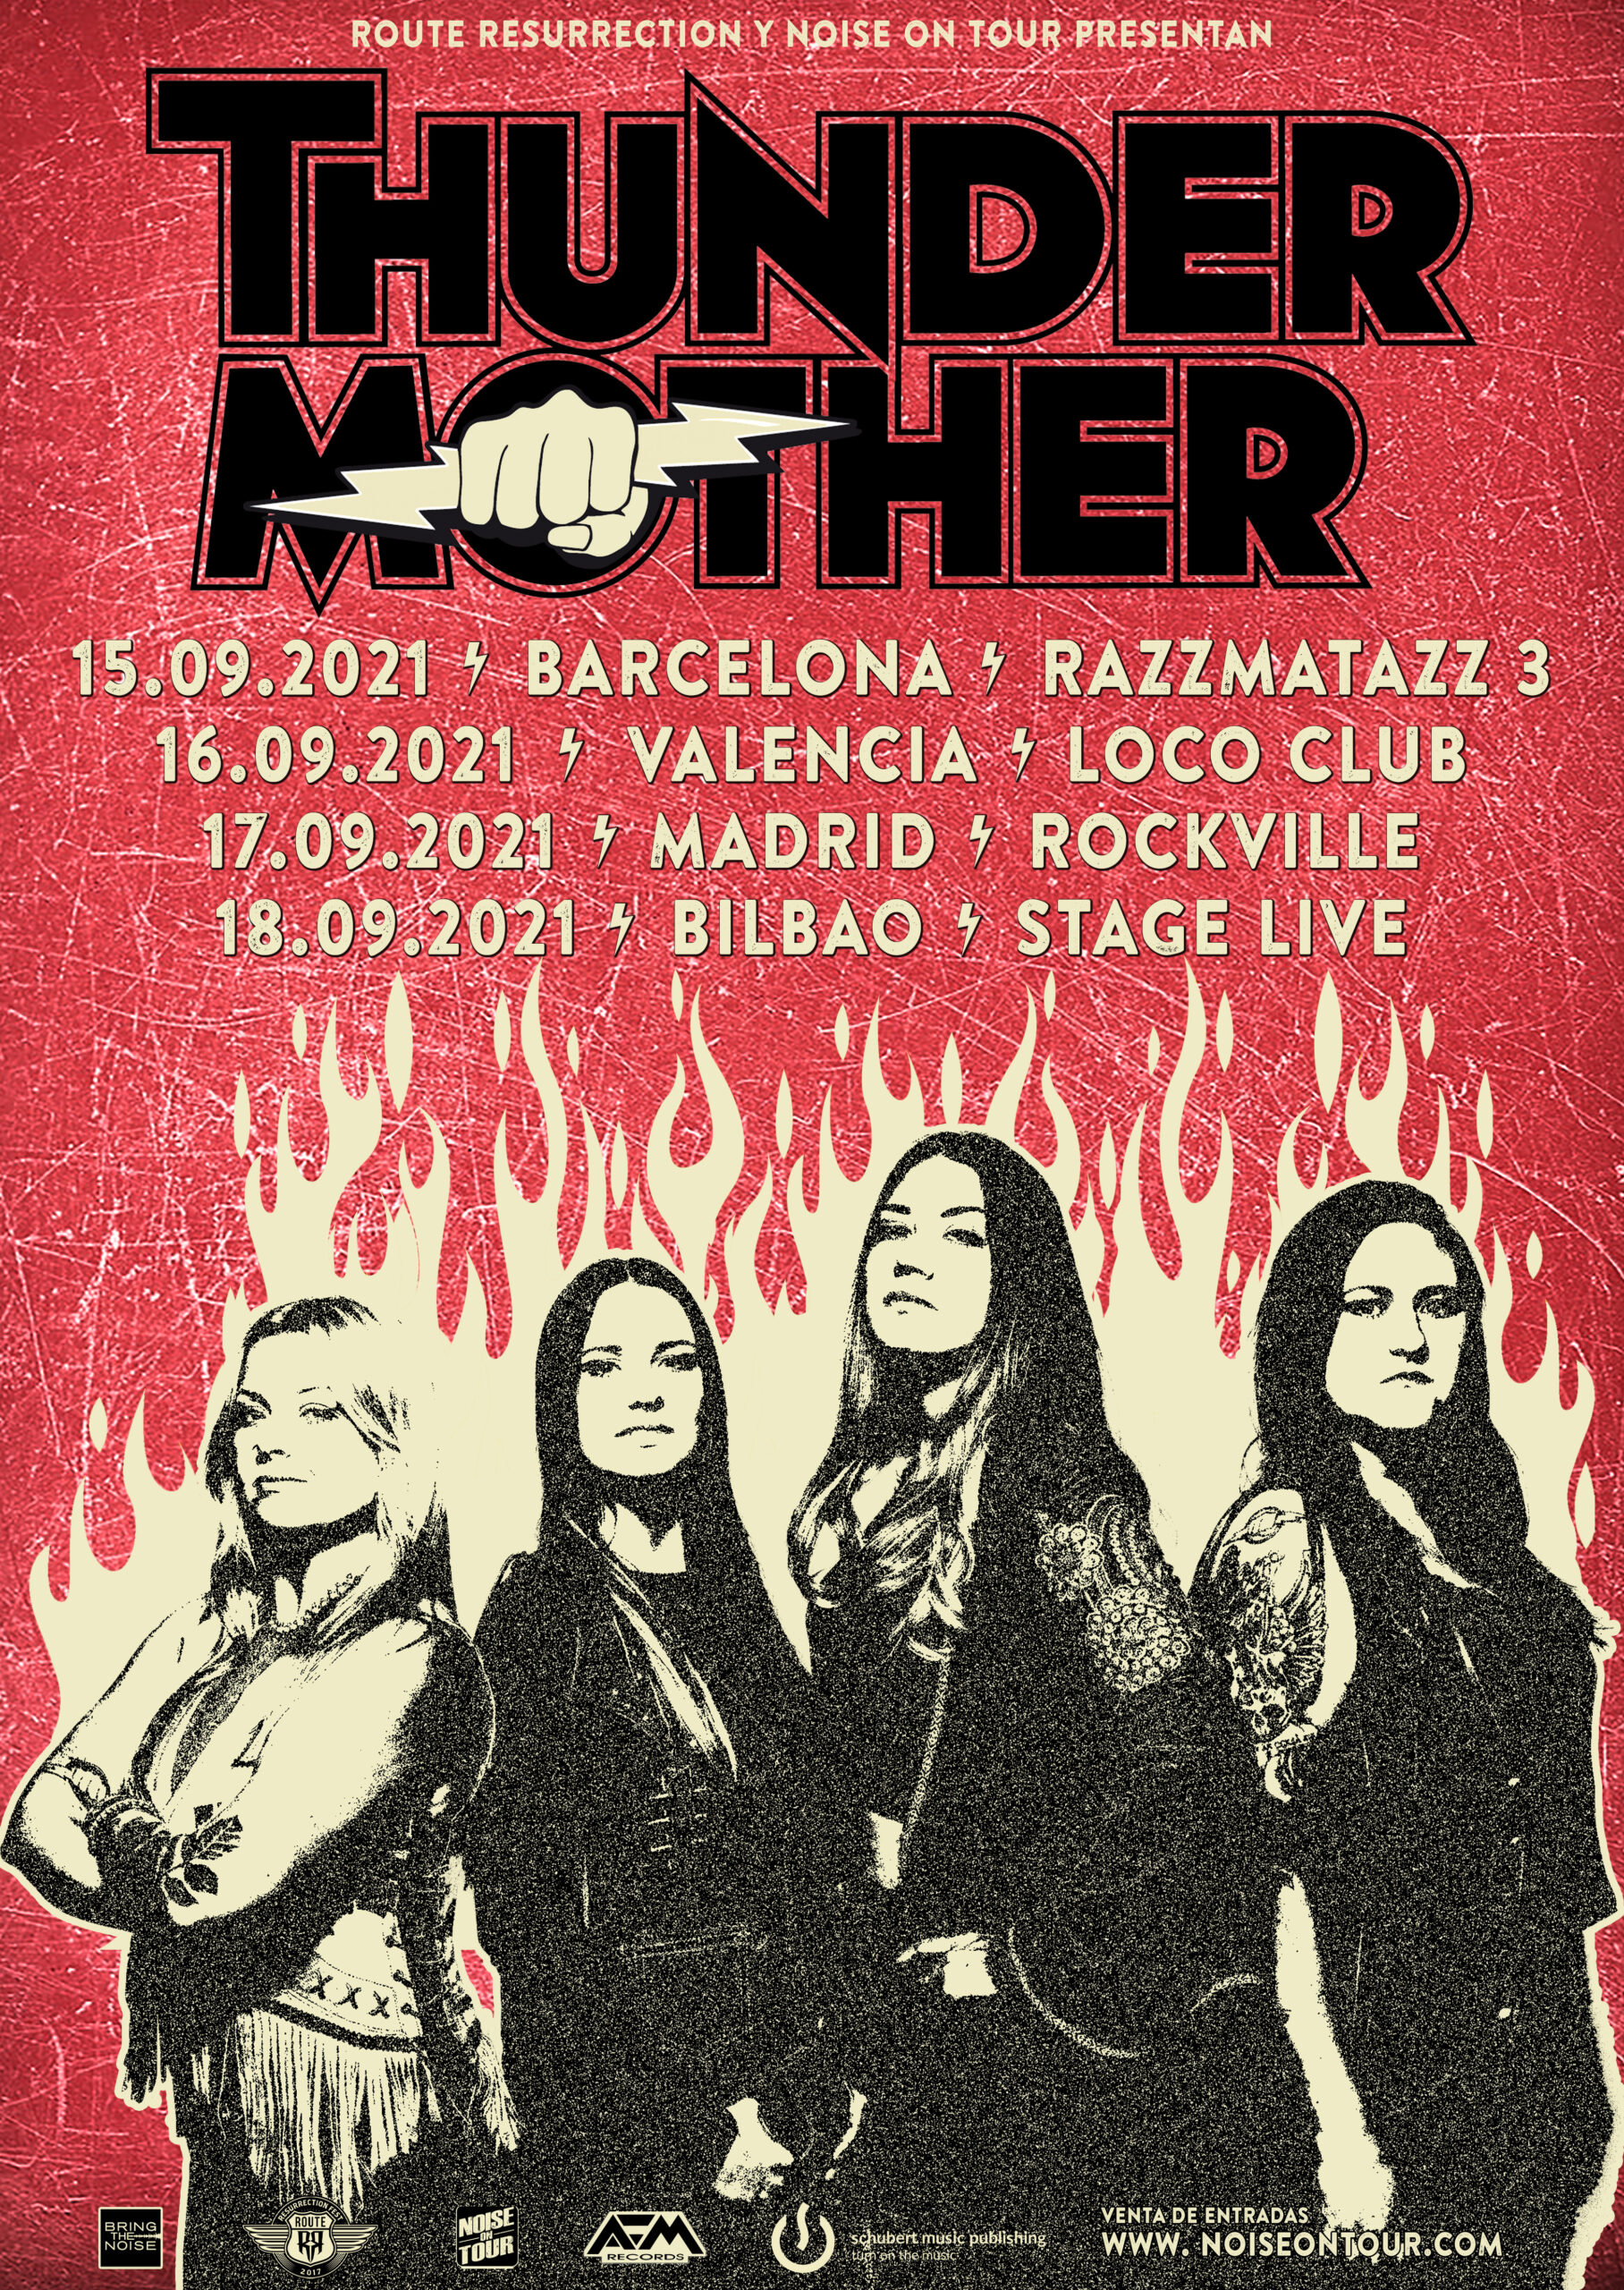 Route Resurrection 2021: Thundermother (Barcelona)